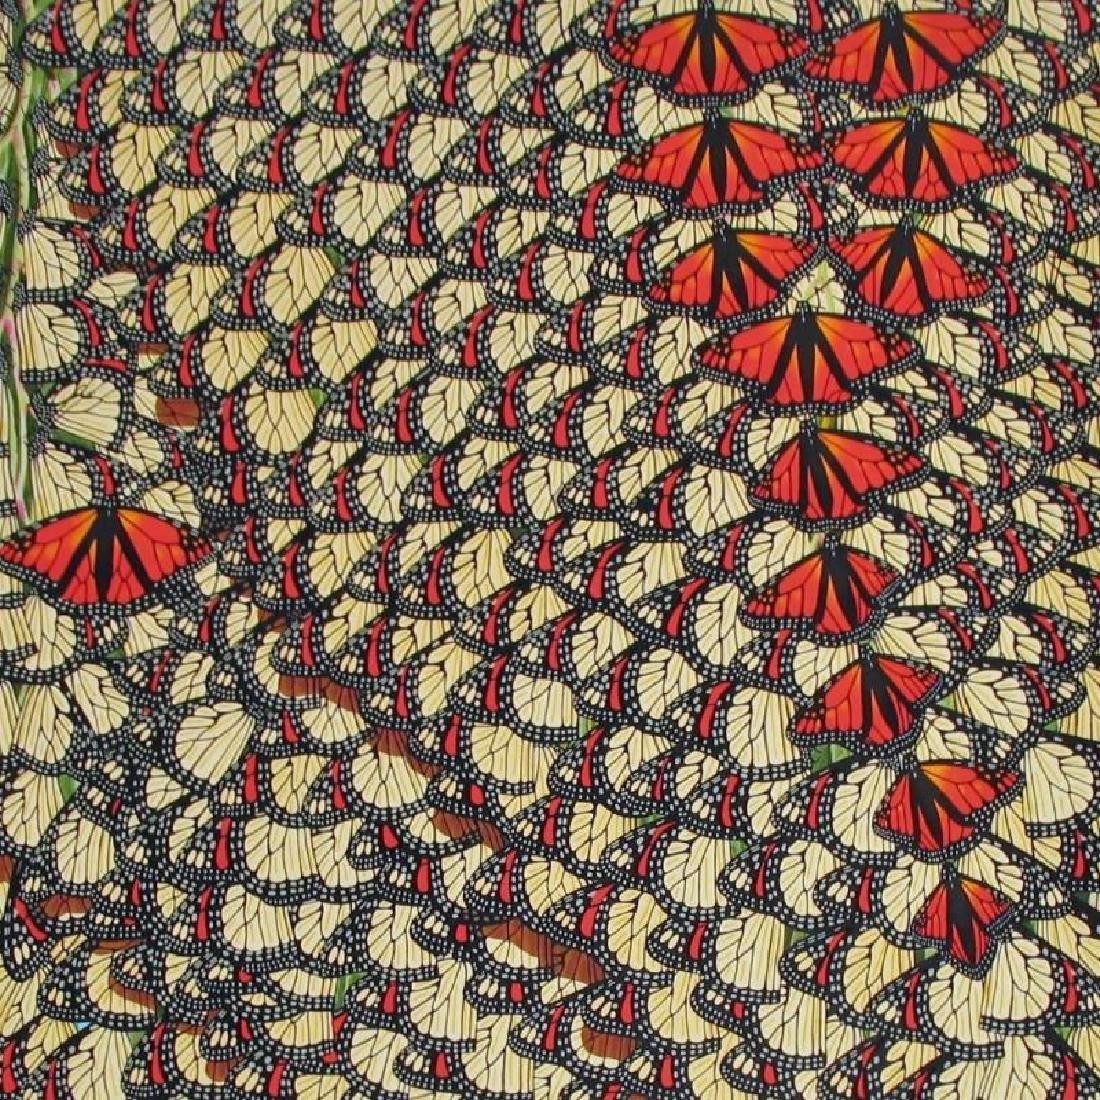 Awesome Butterfly Christine Avenue Ltd Ed Sale - 3